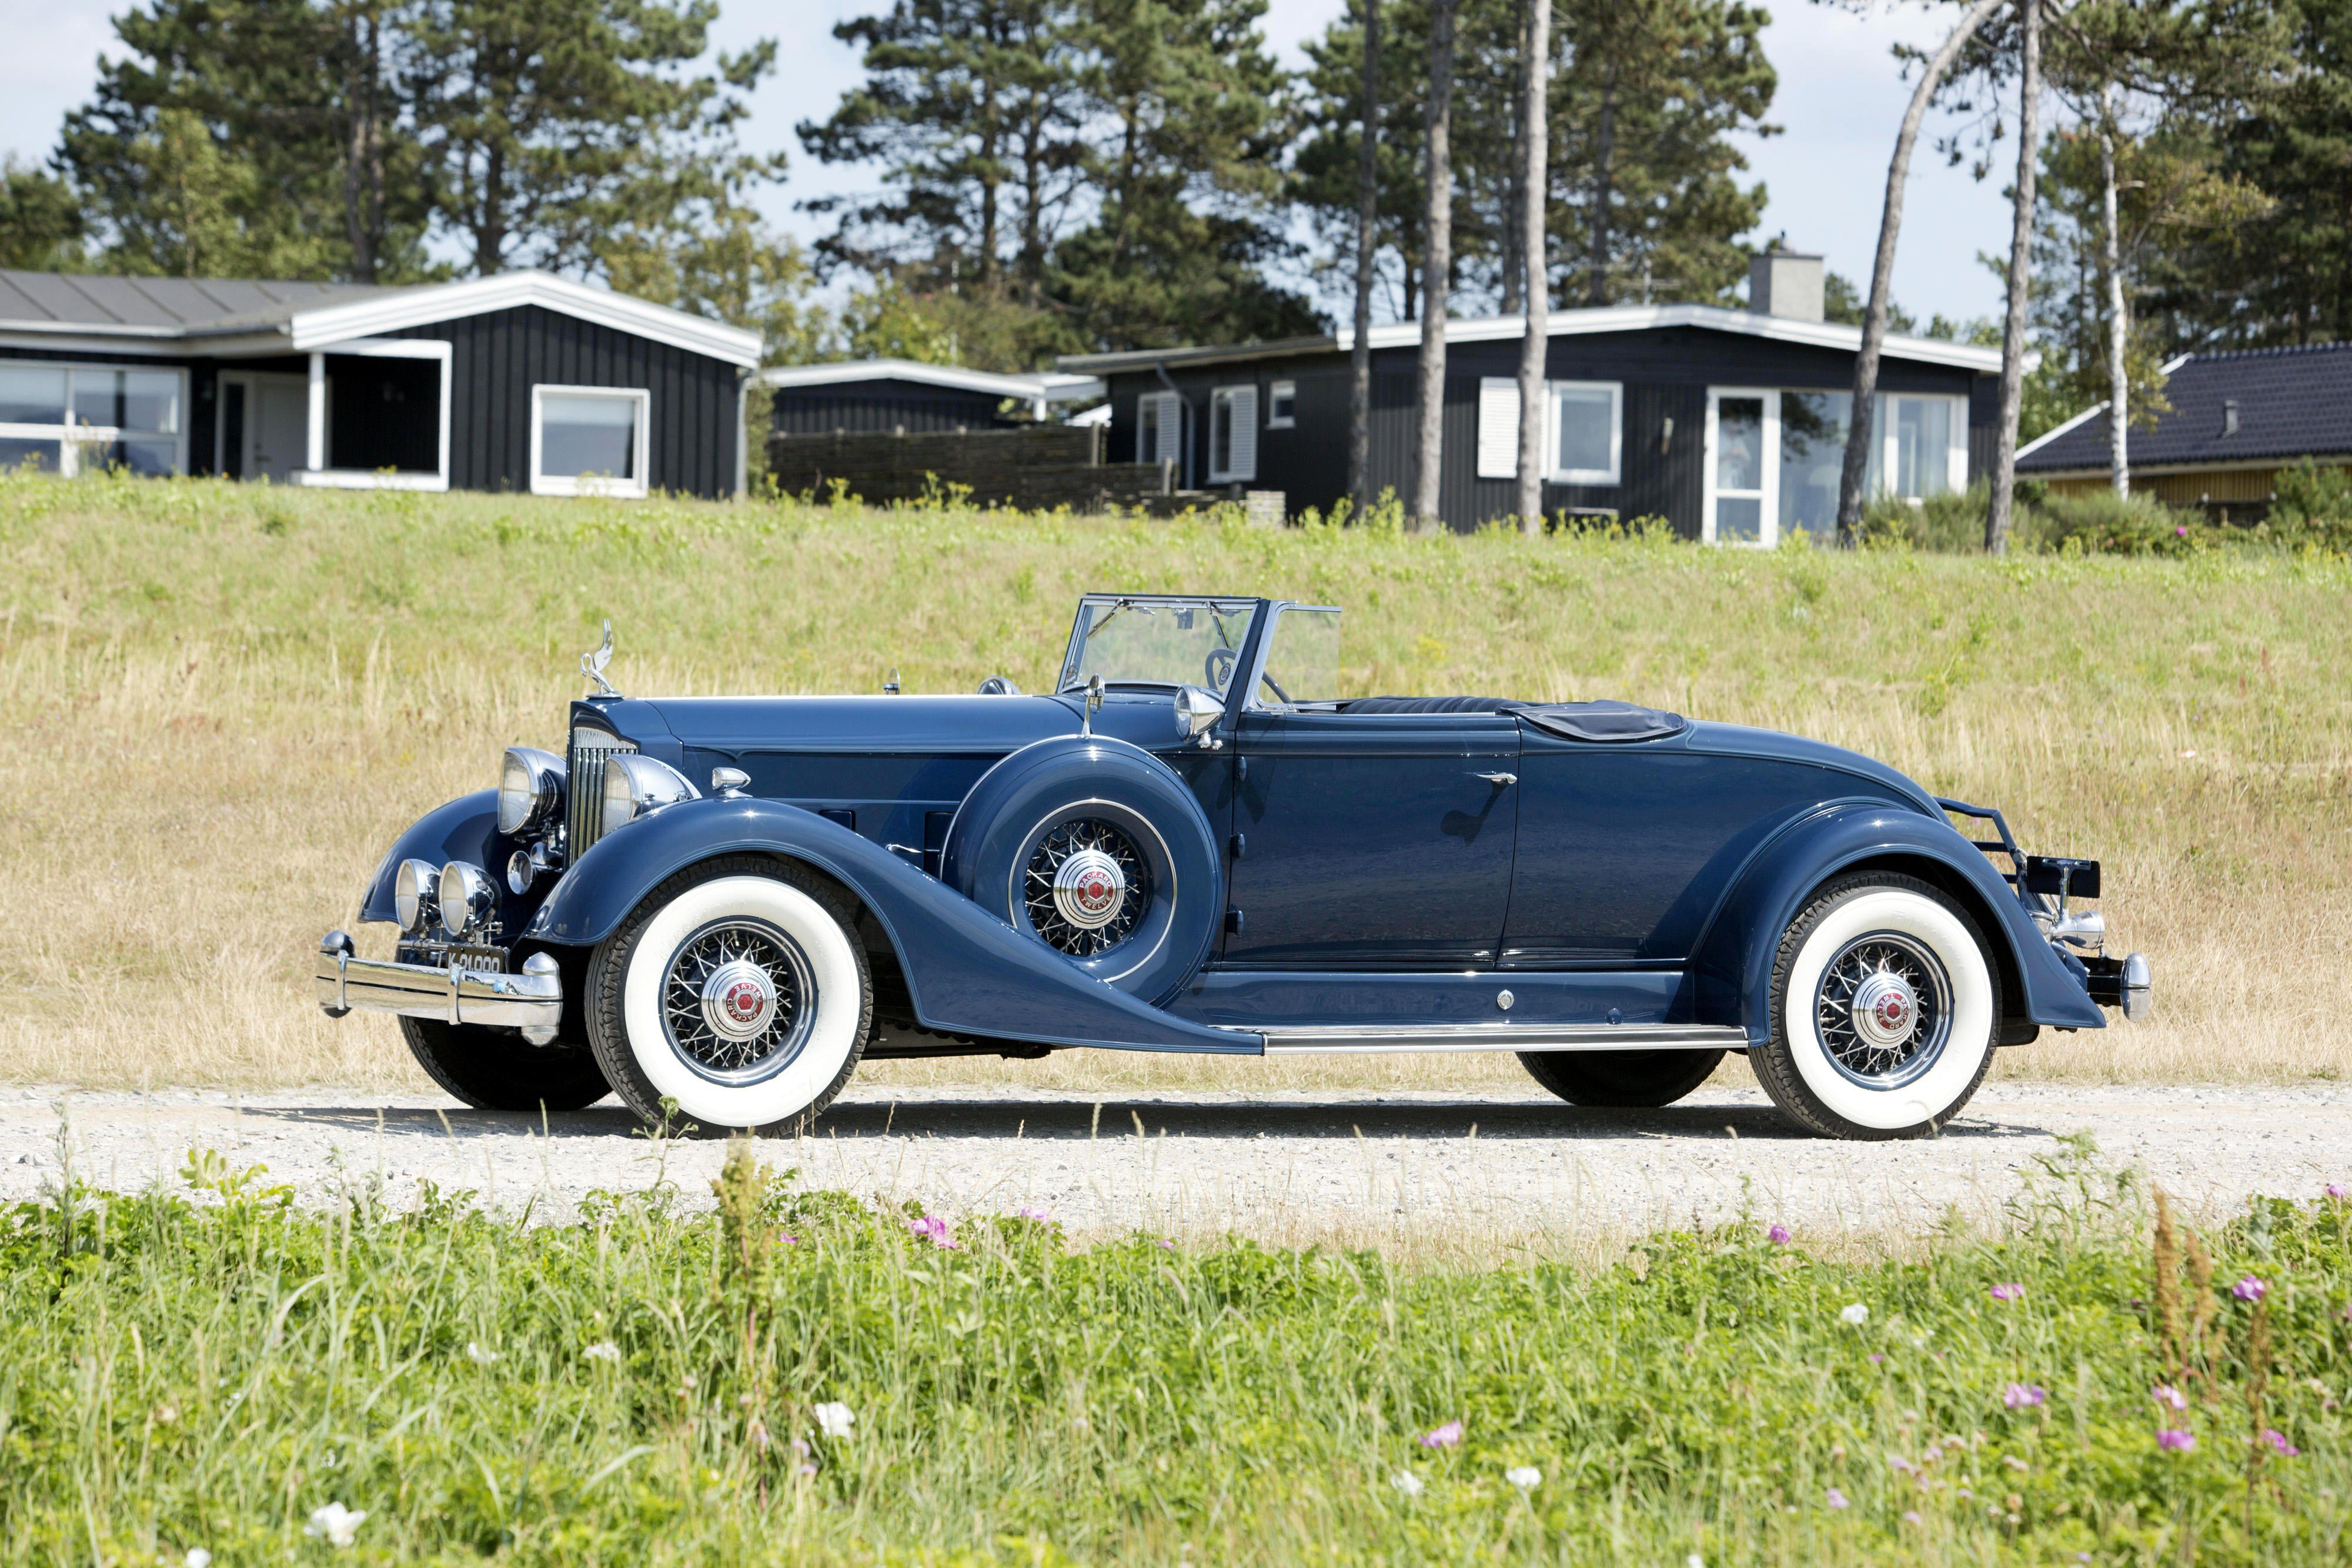 Wonderful Old Classics Contemporary - Classic Cars Ideas - boiq.info